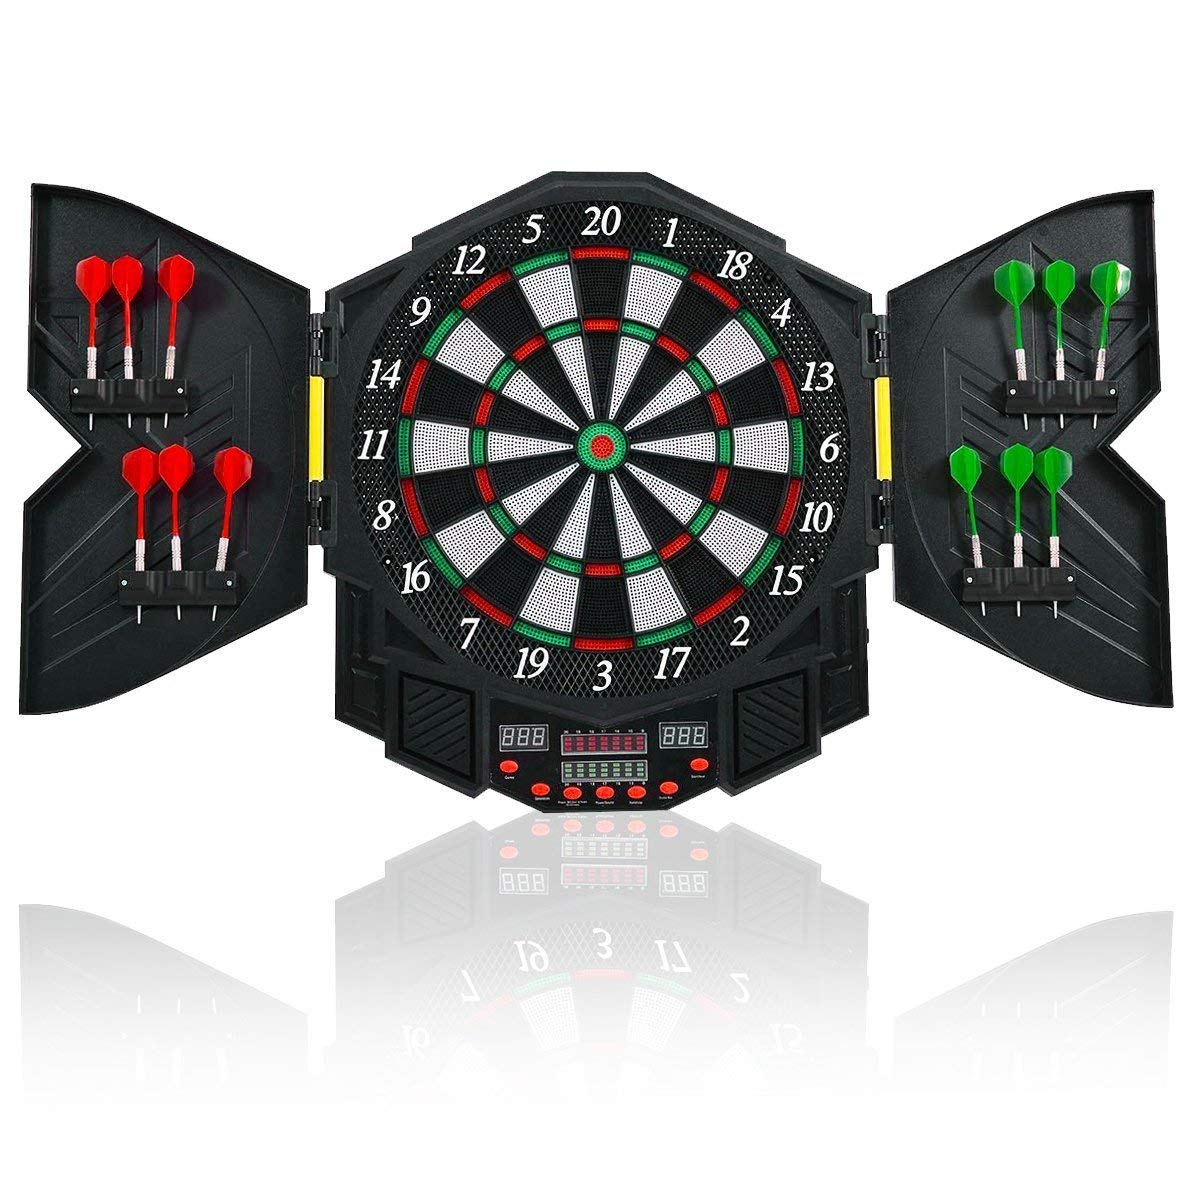 Goplus Electronic Dart Board Set Sport Game Cabinet LED Display Professional Dartboard w/12 Darts